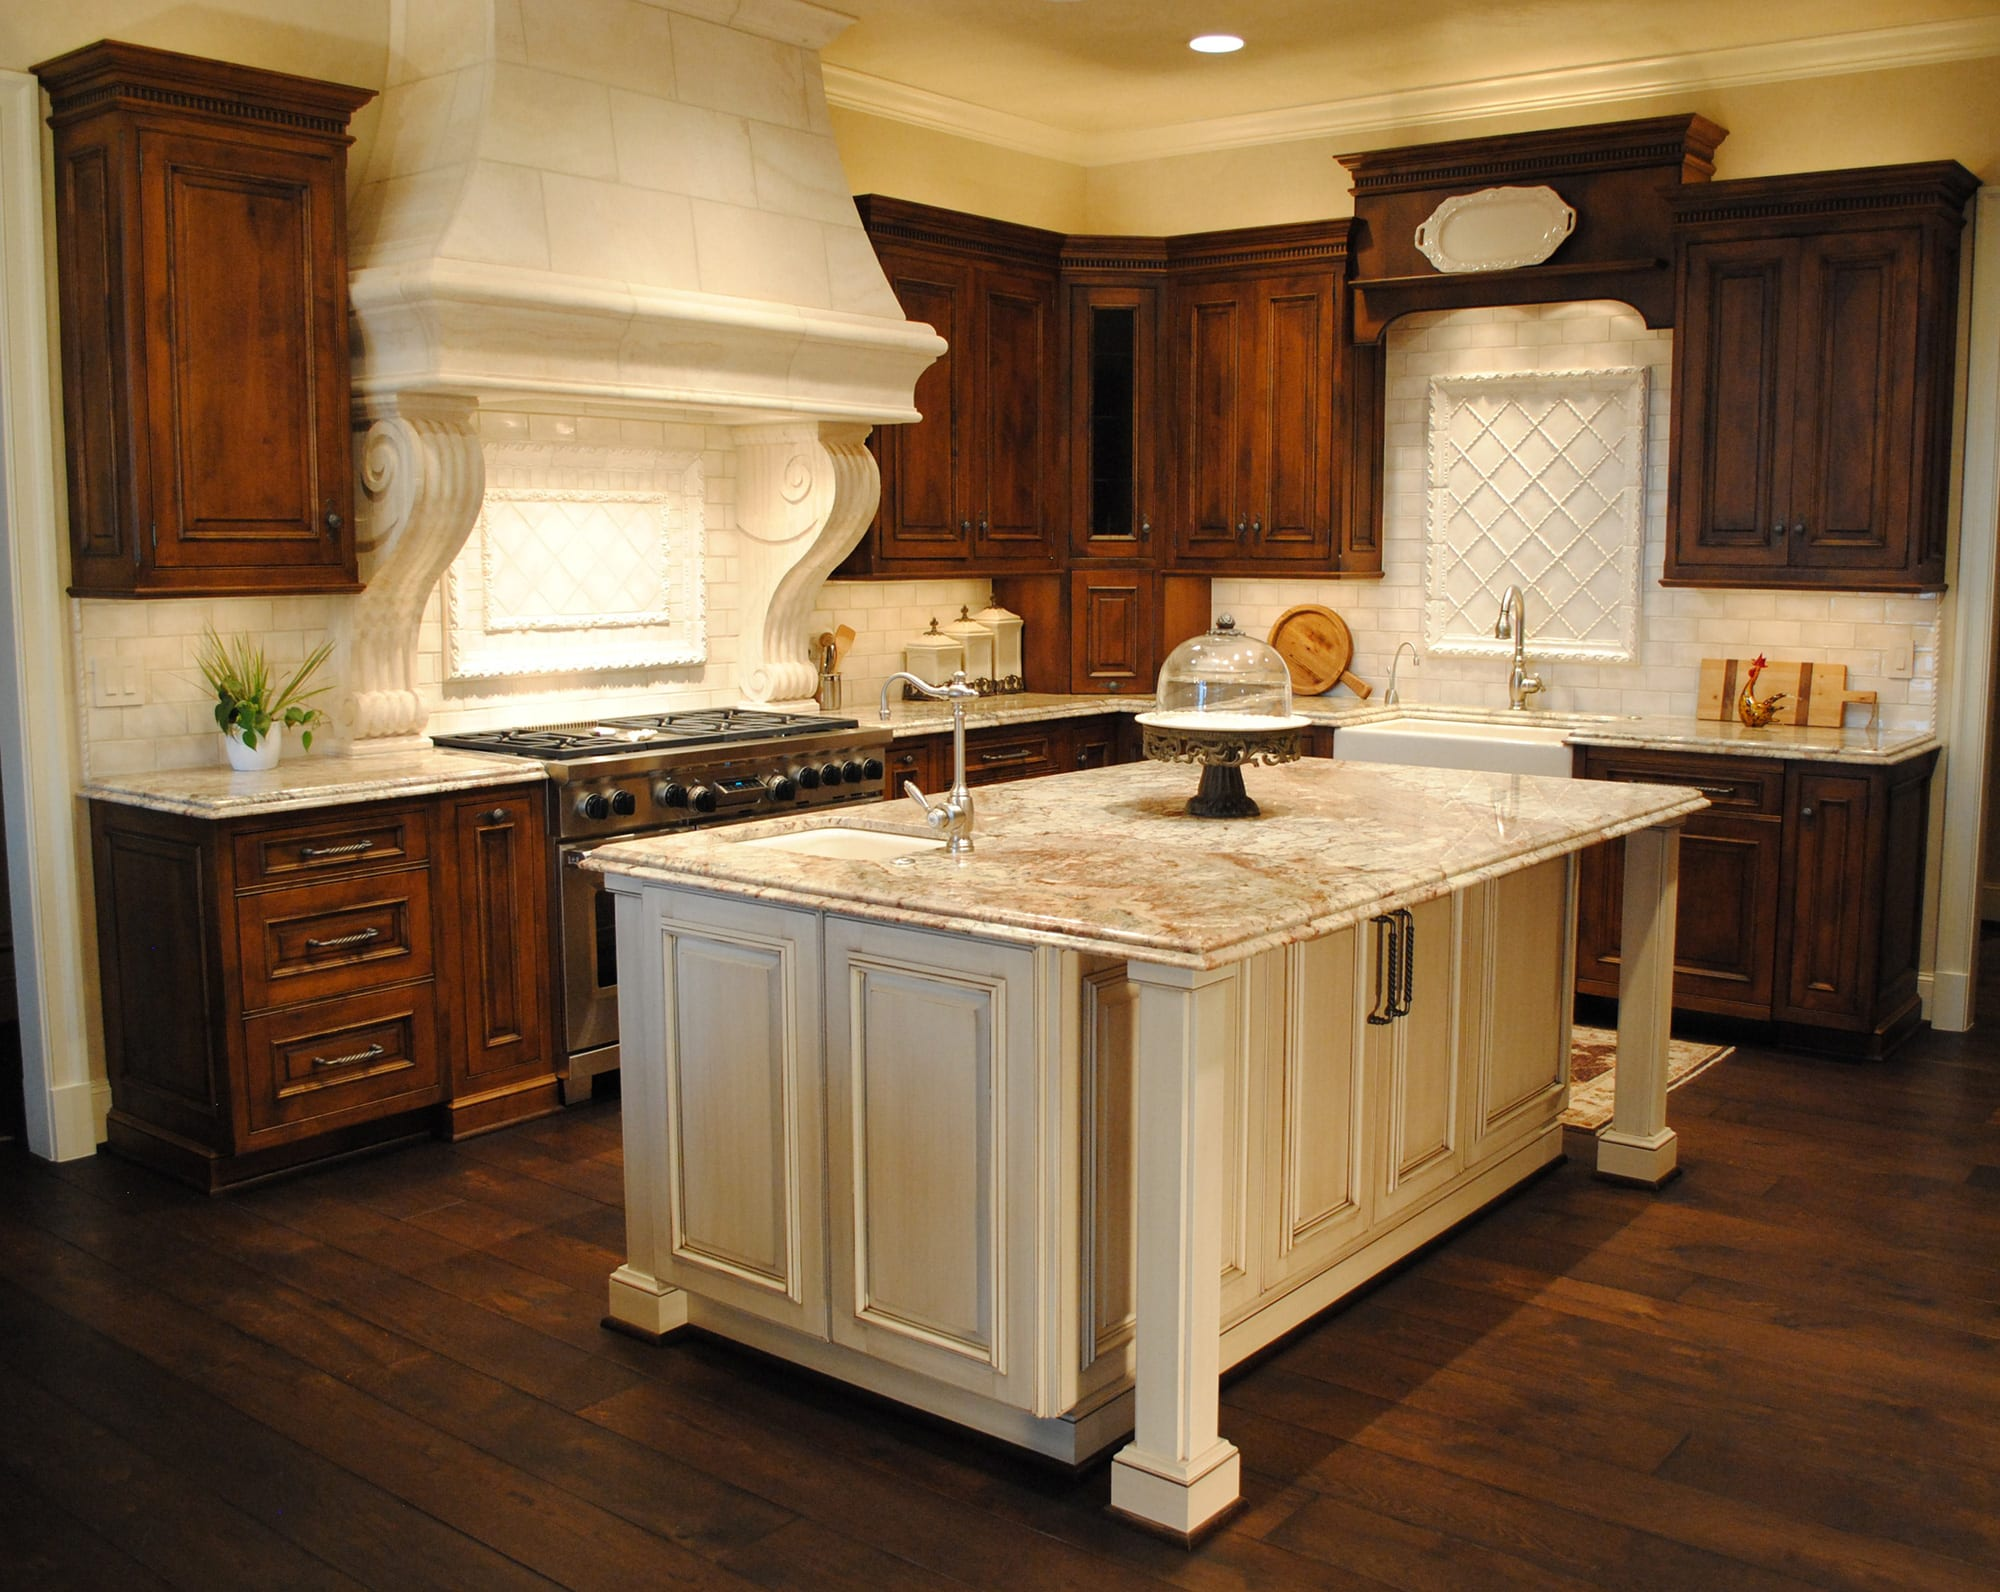 Wood mode kitchen cabinets wood mode kitchen cabinets for Wood mode kitchen cabinets reviews